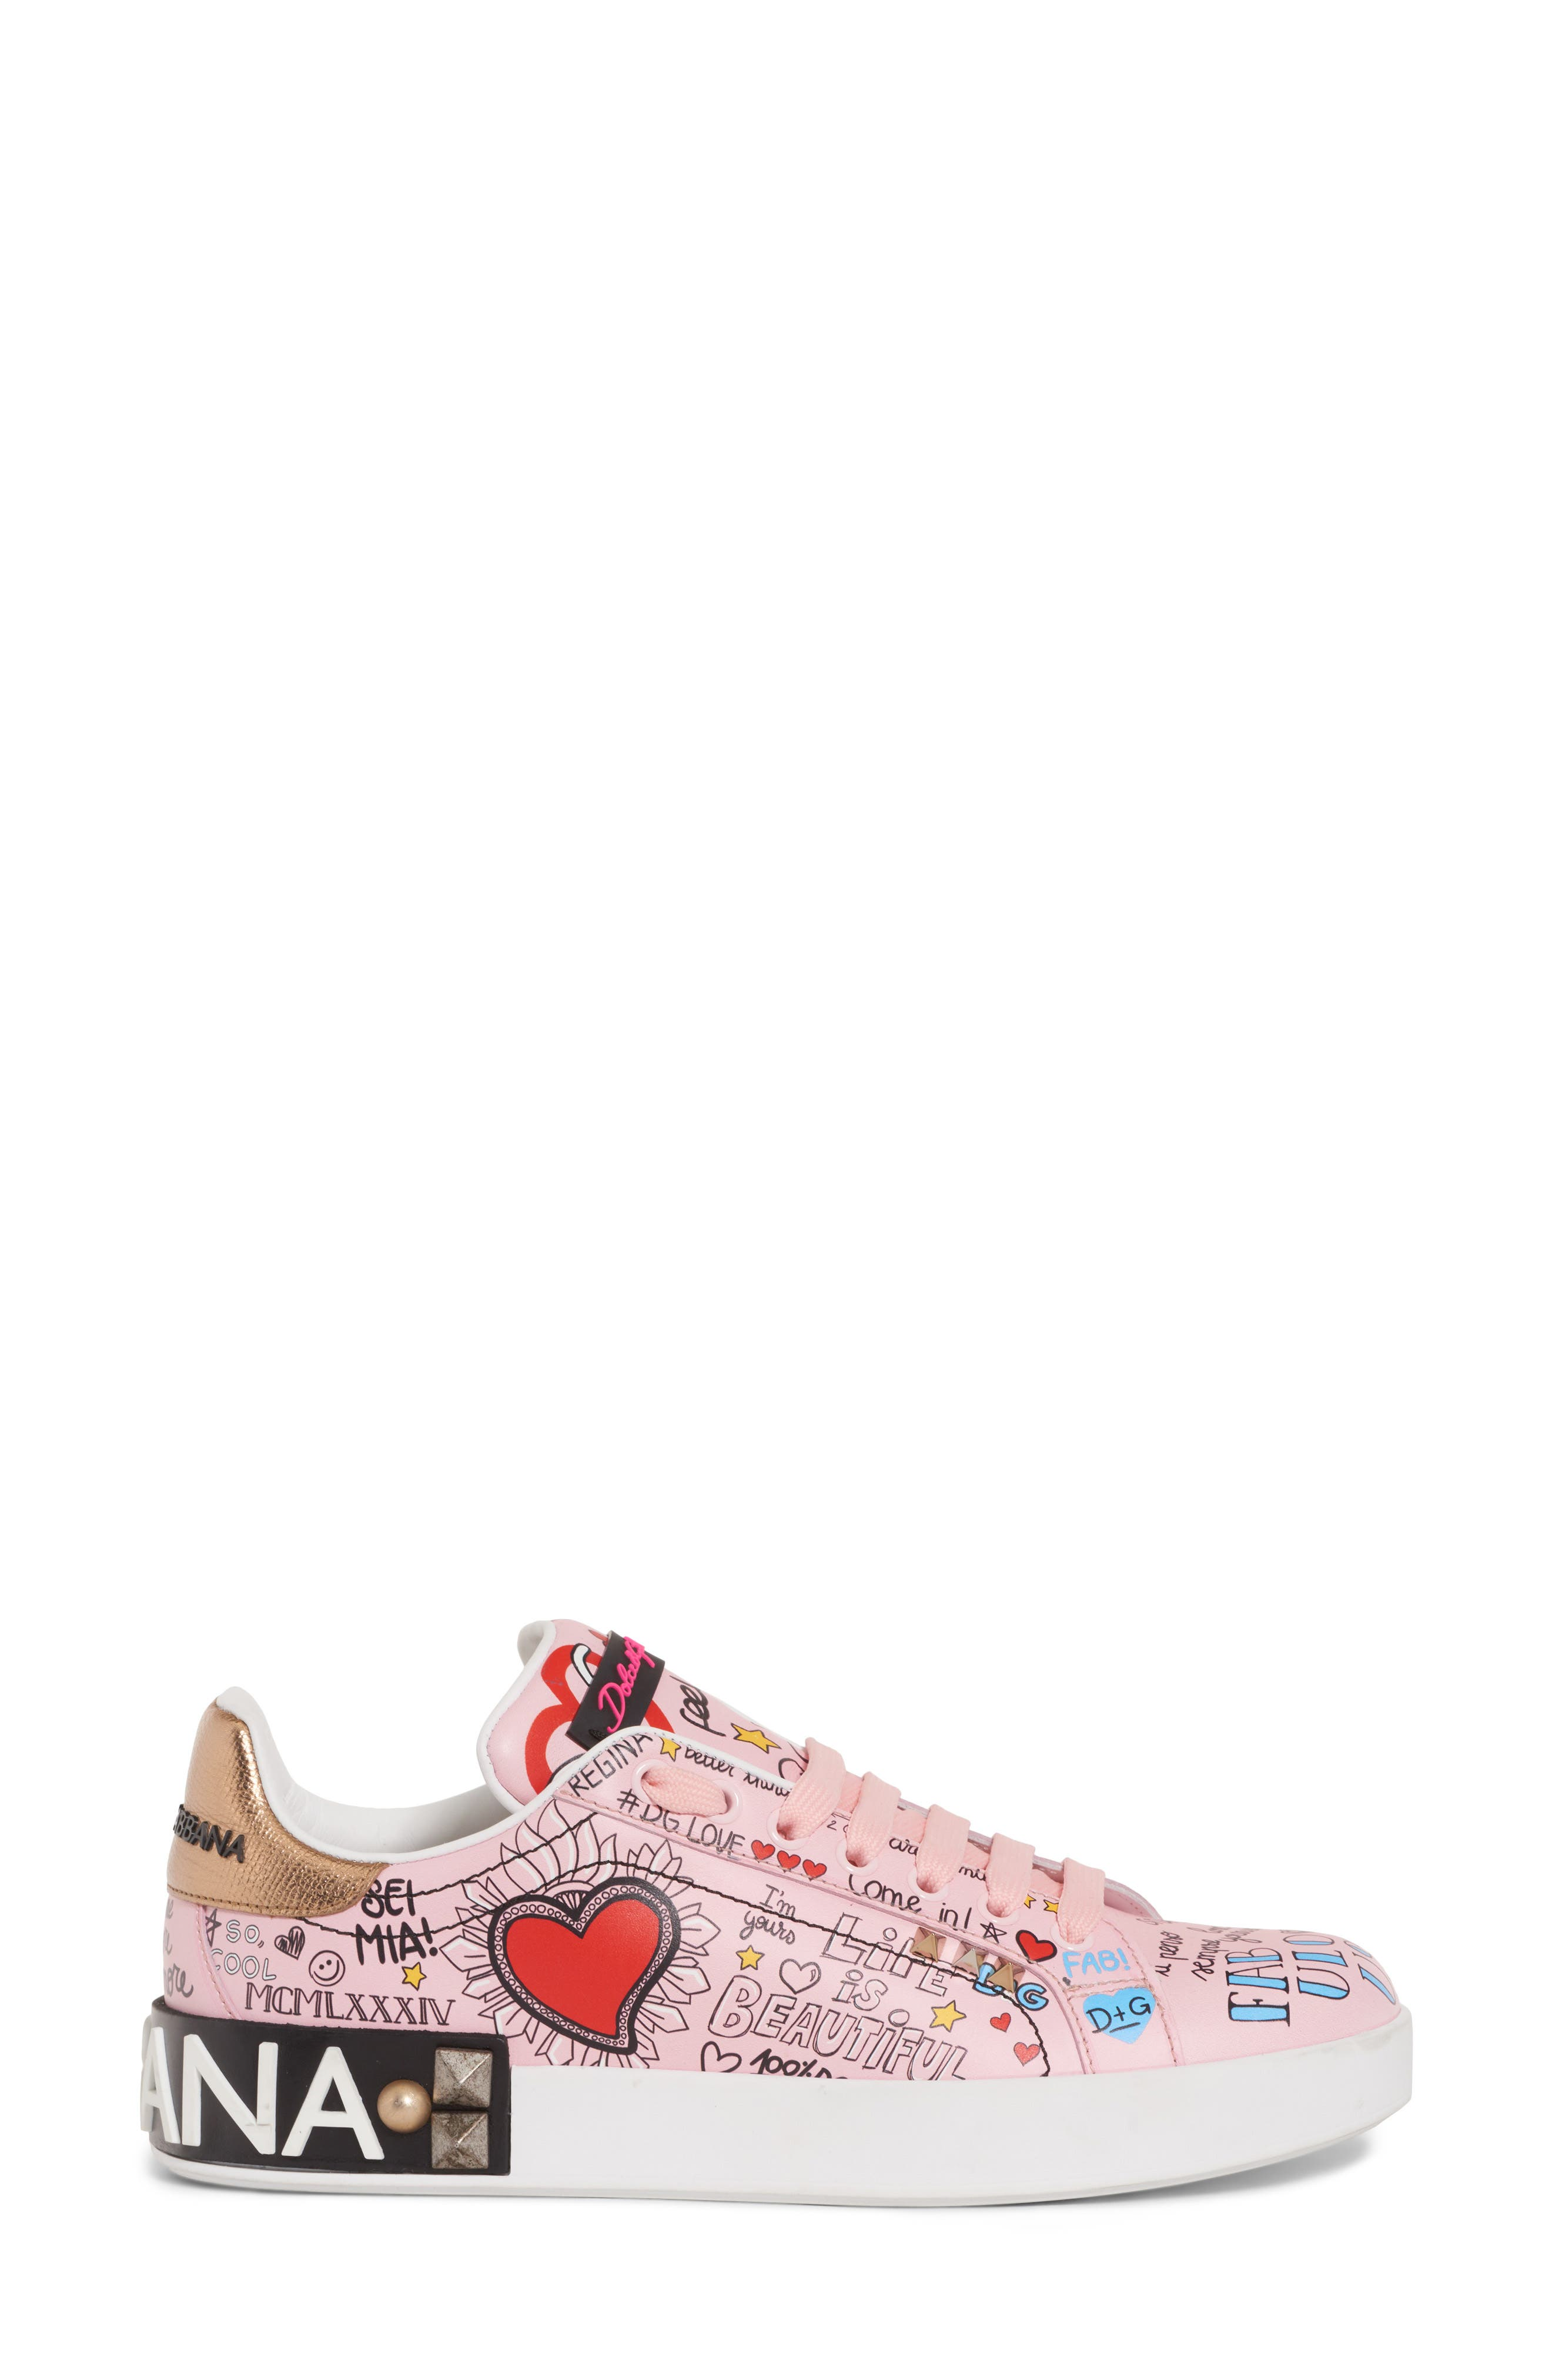 DOLCE&GABBANA,                             Mural Graffiti Sneaker,                             Alternate thumbnail 3, color,                             690